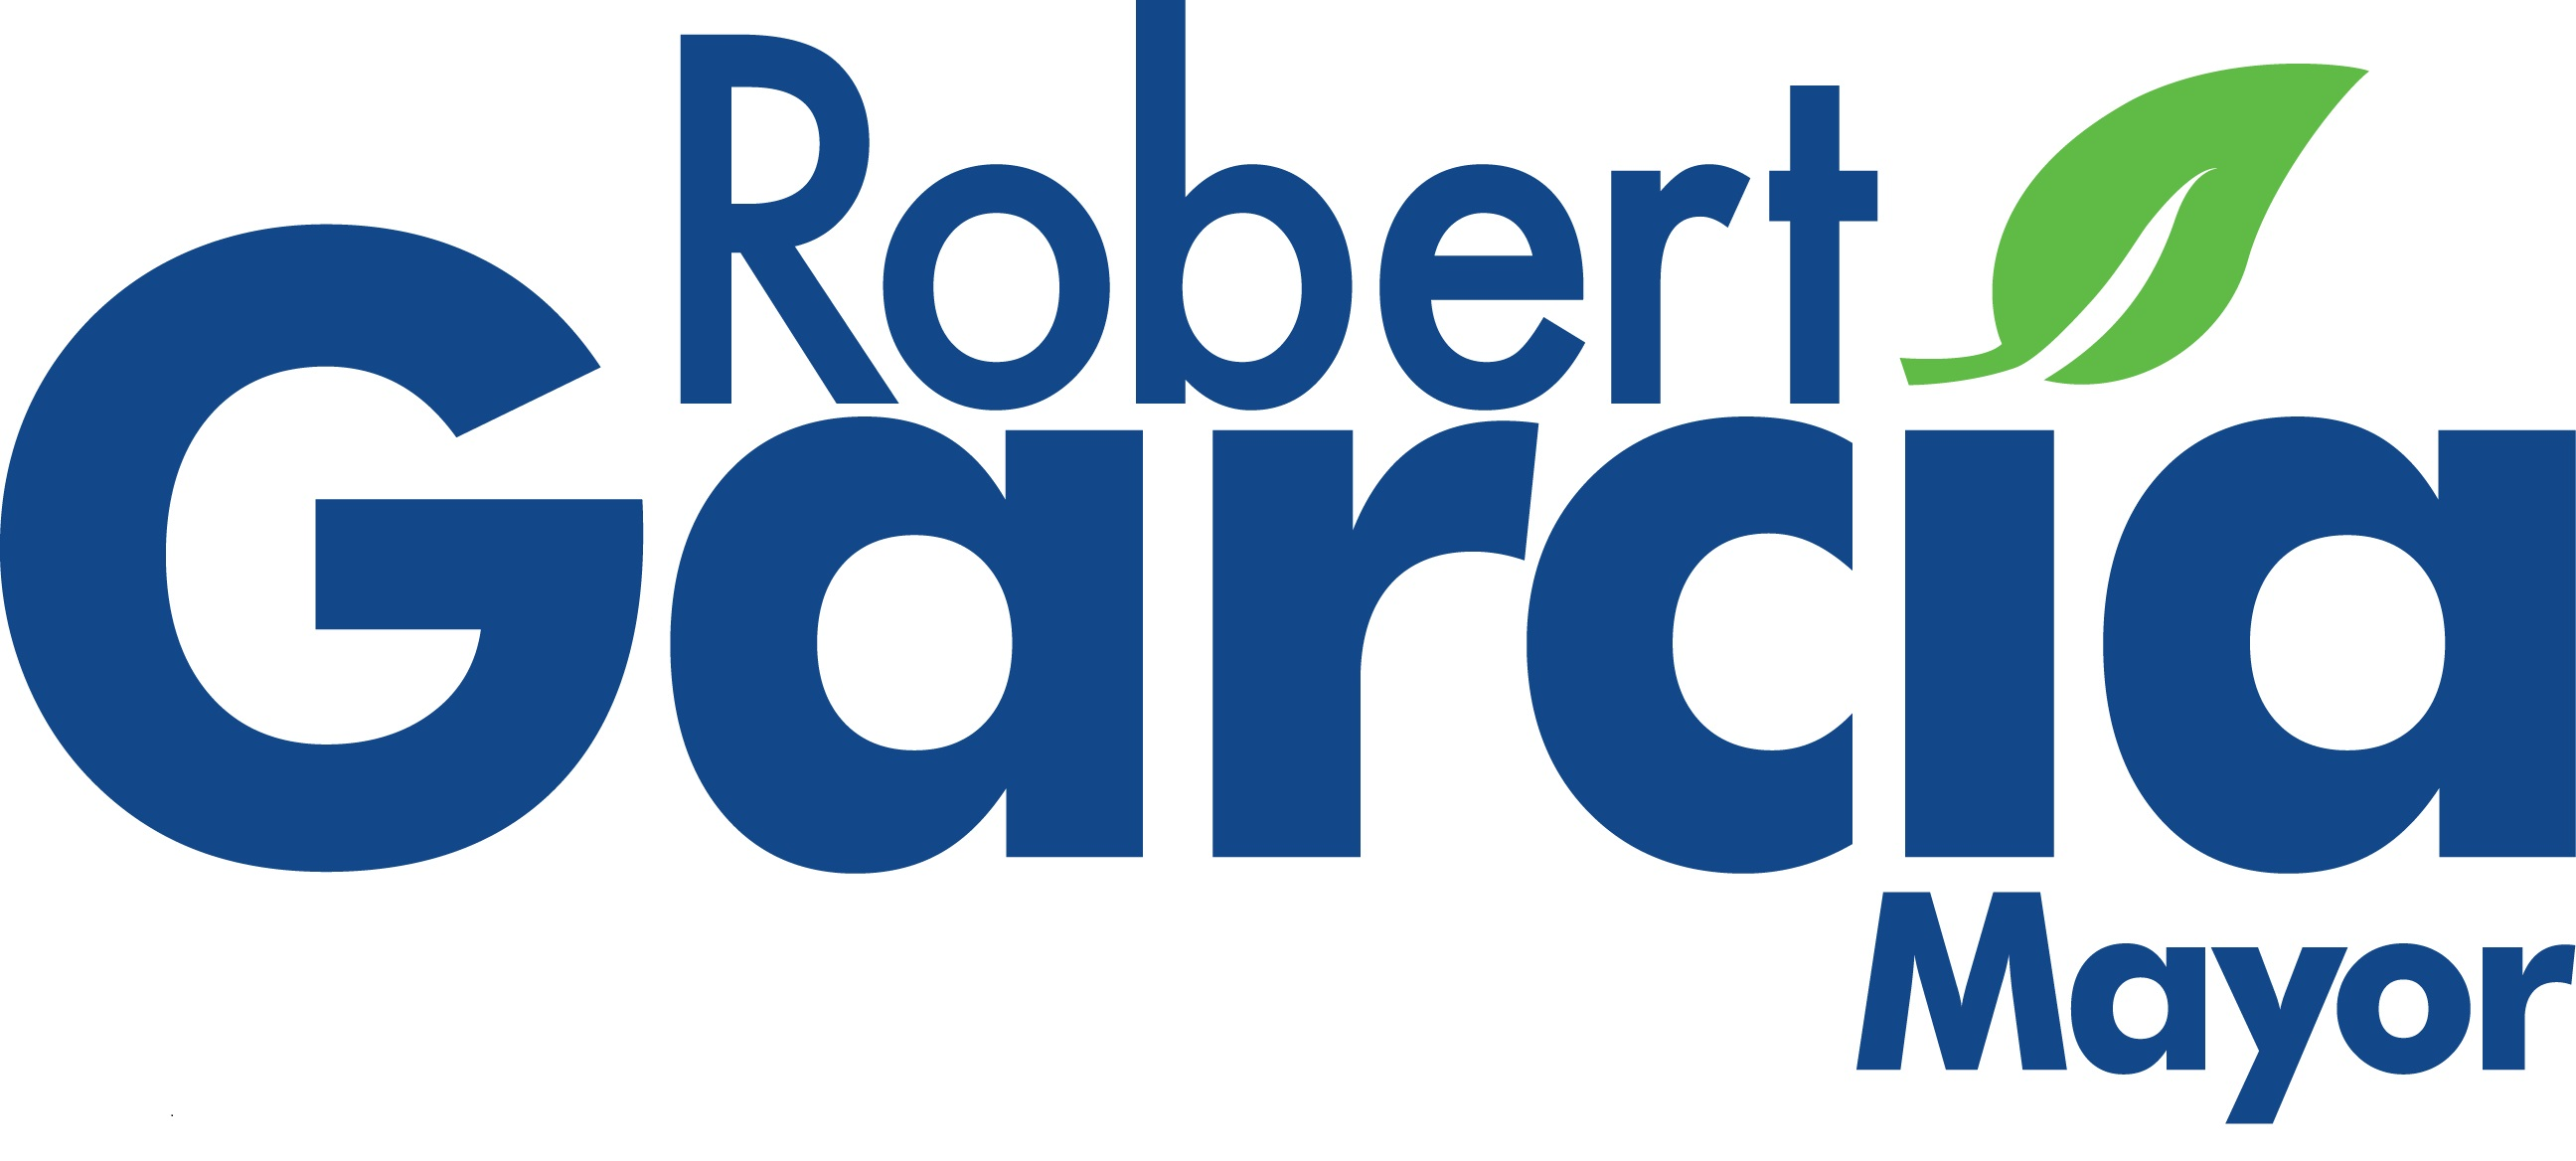 RobertGarcia-Mayor.jpg